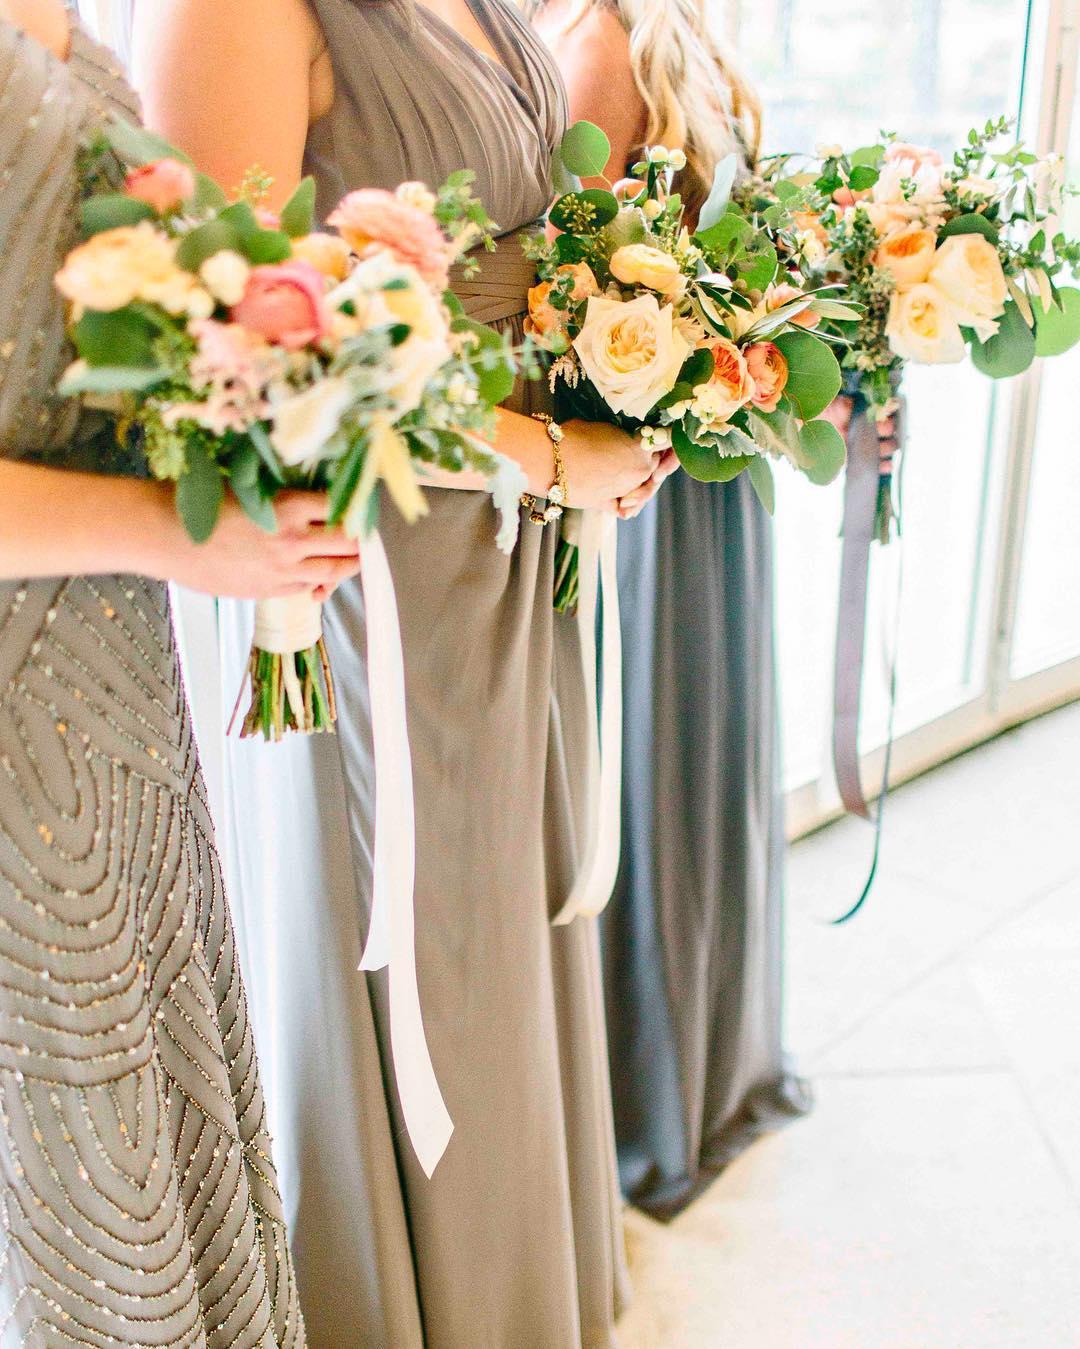 {her girls} photo | @kellydillonphotography  #capecodwedding #bridesmaids #thesedresses #bouquets #lovely #lotusfloraldesigns #weddingflorist